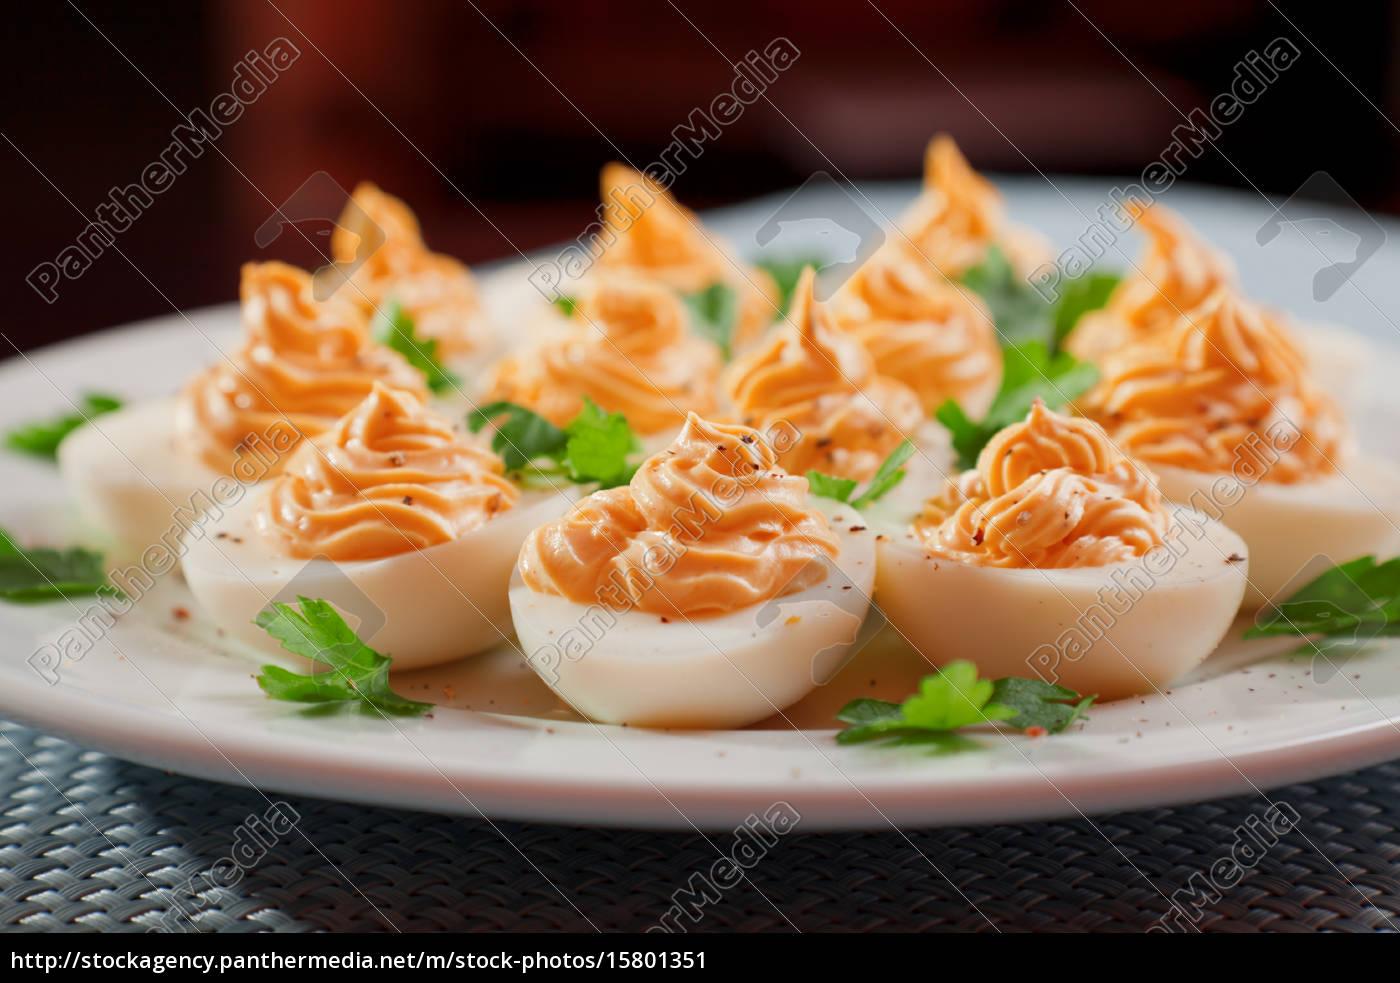 stuffed, eggs, stuffed, eggs, stuffed, eggs, stuffed, eggs - 15801351